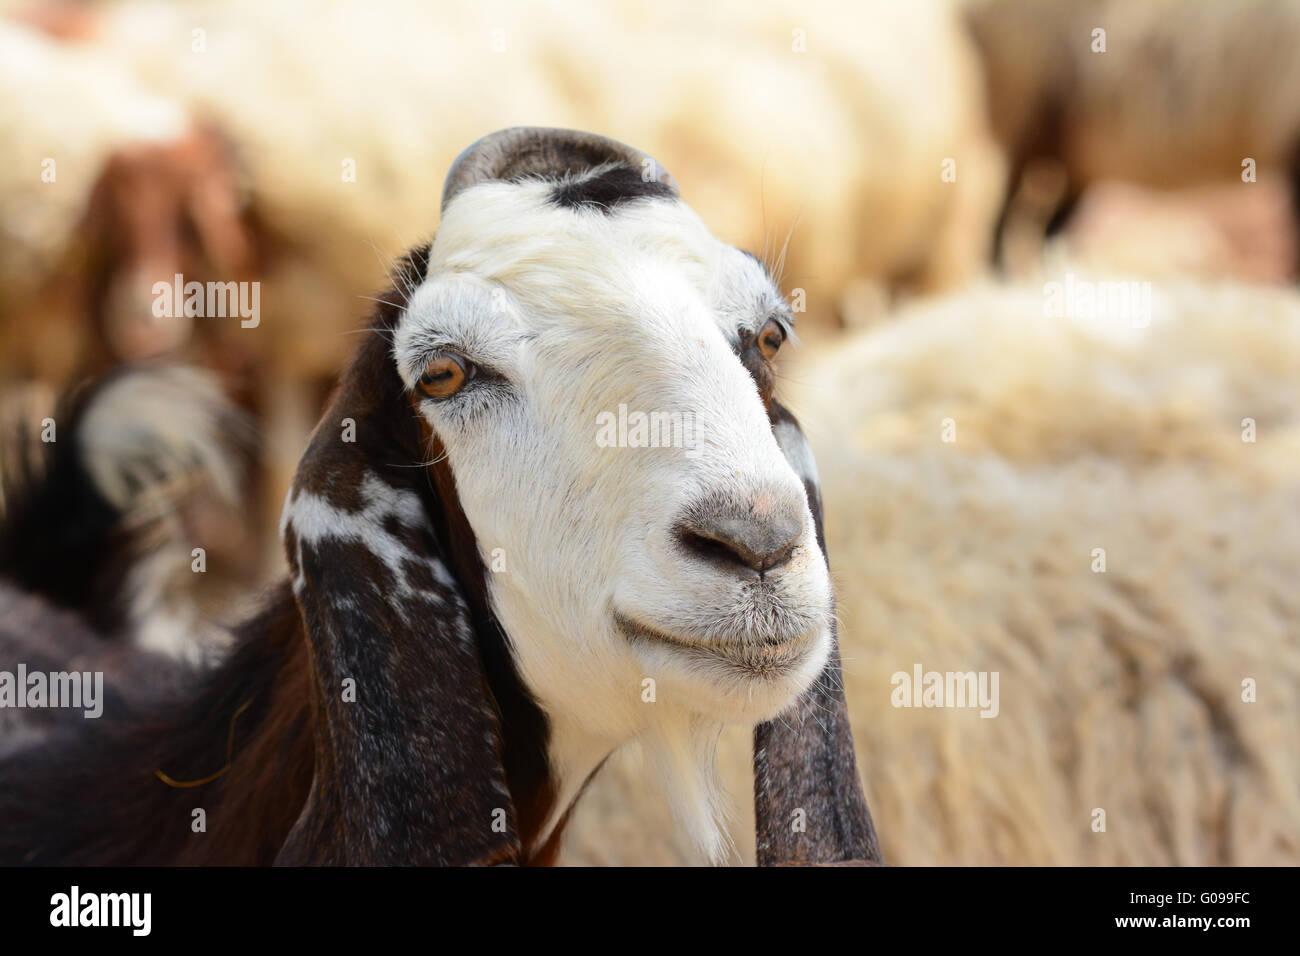 Goat portrait - Stock Image